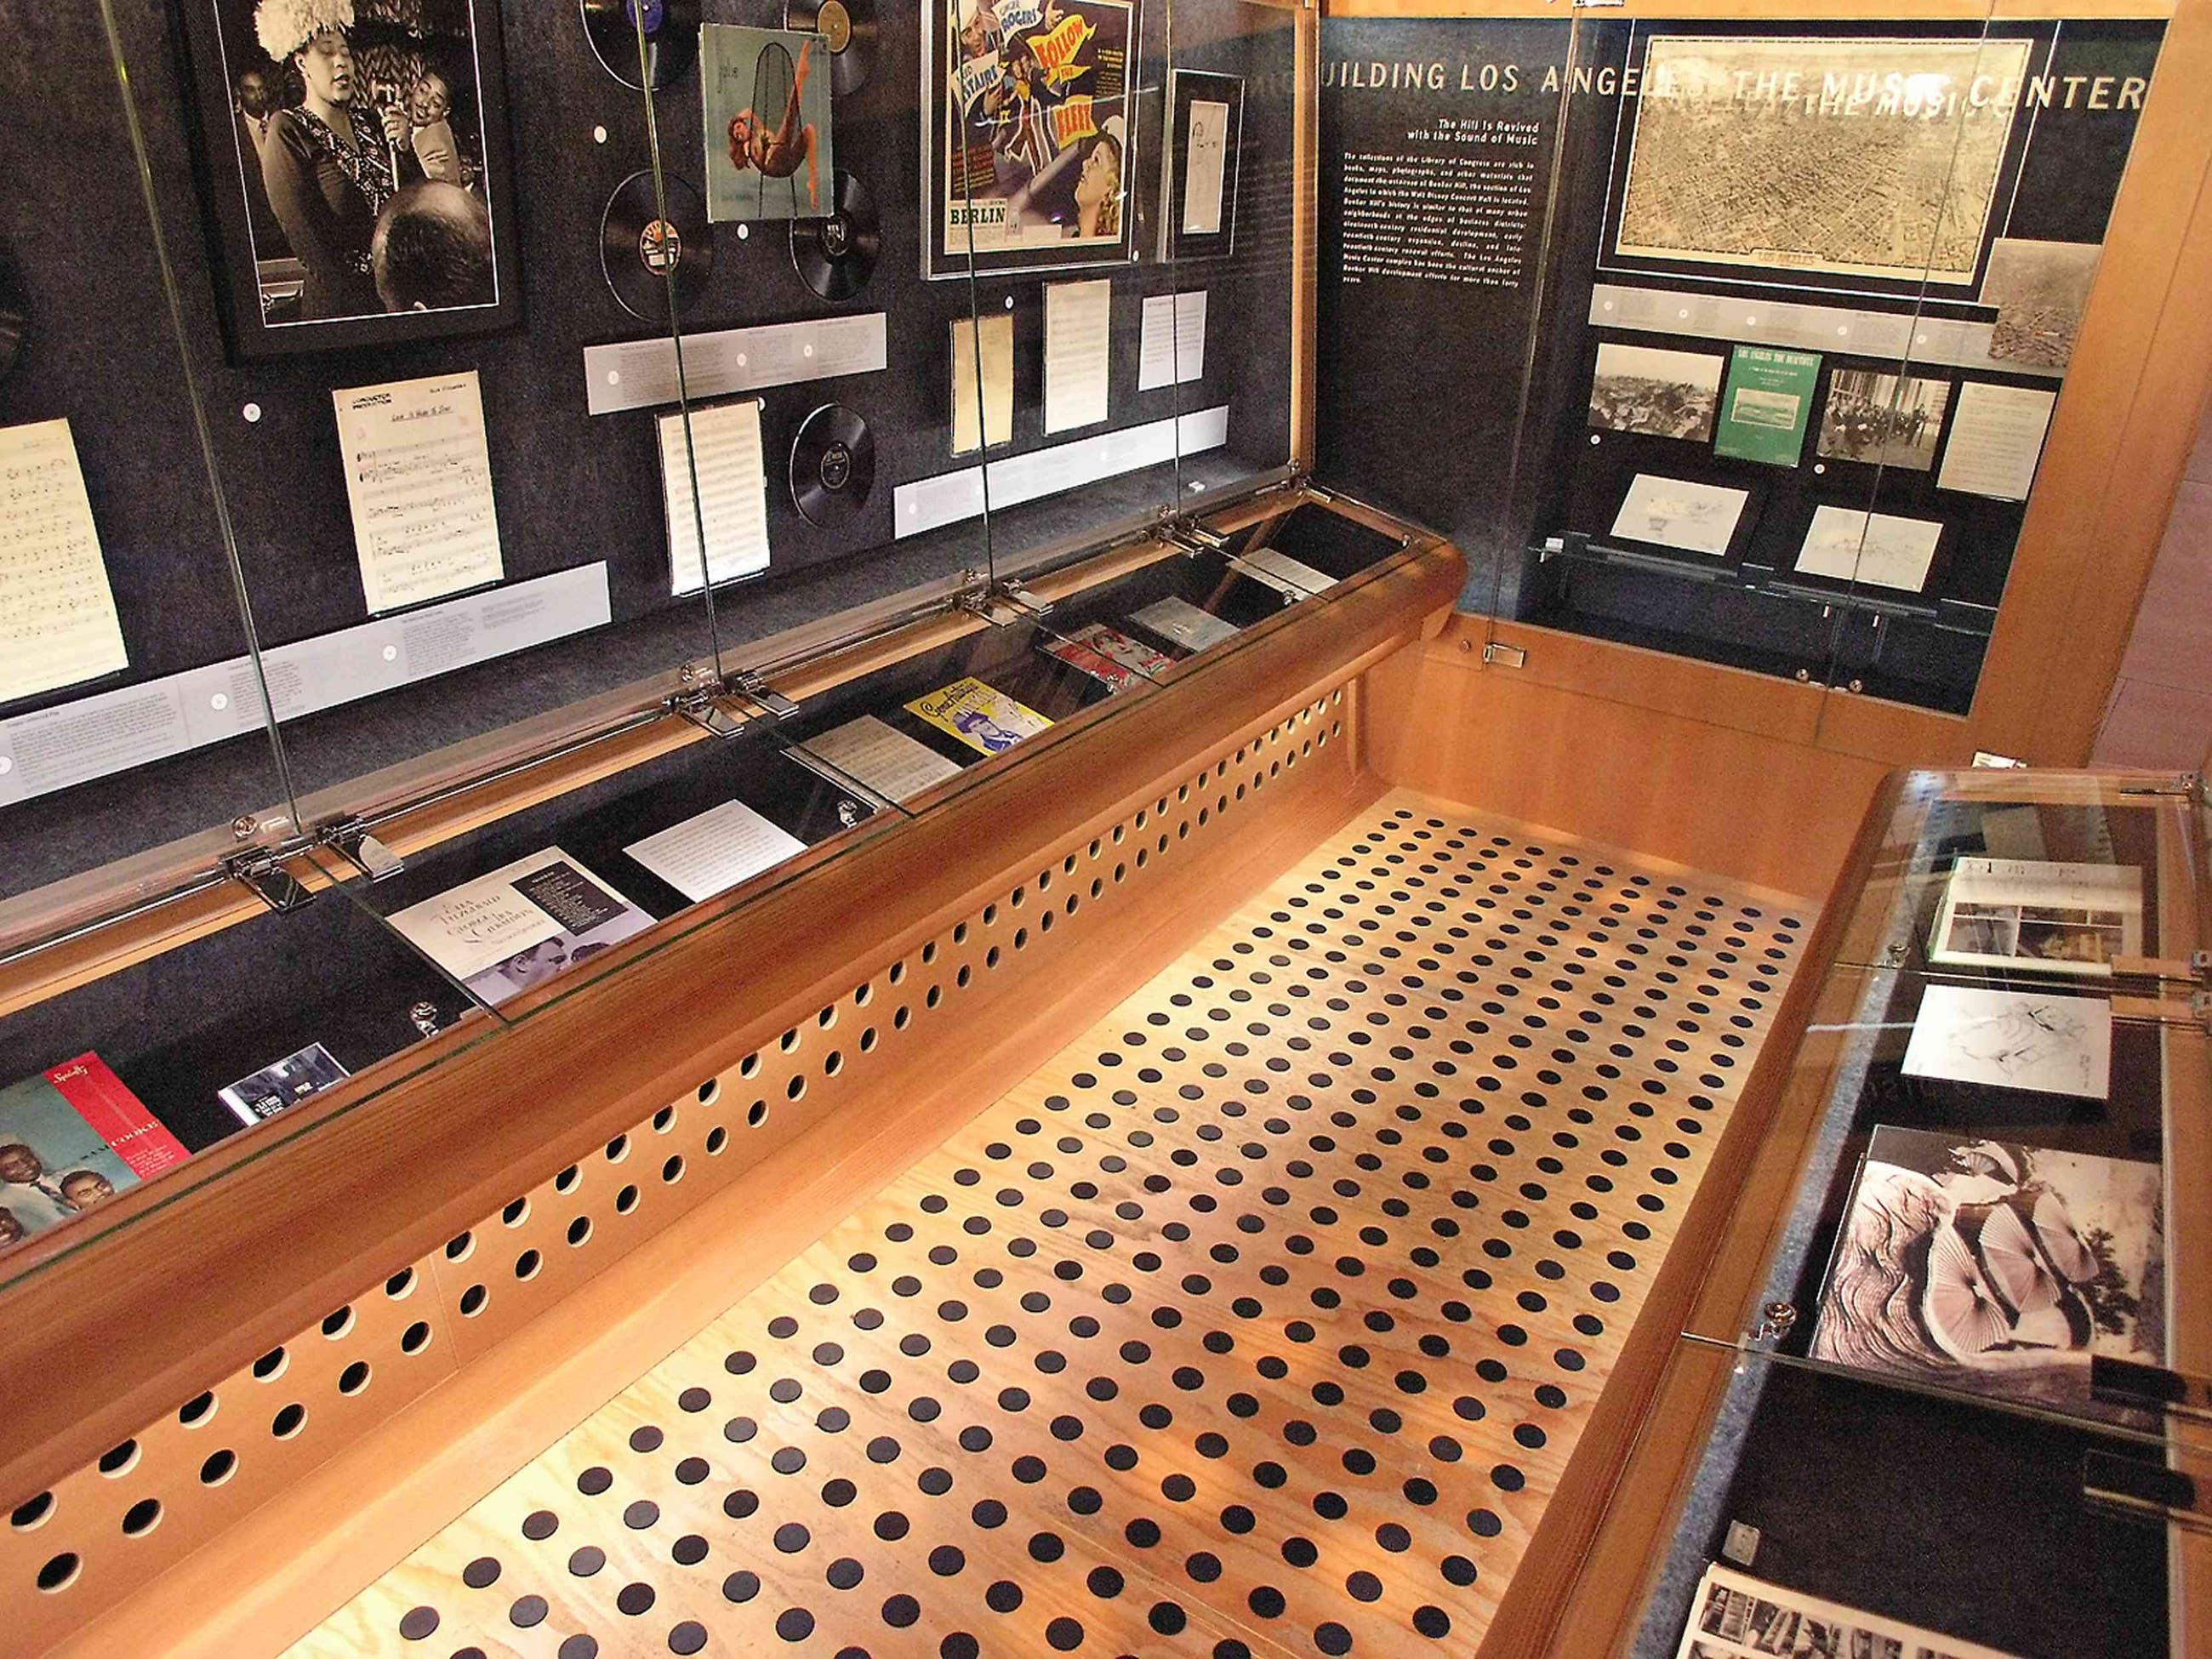 The Library of Congress/Ira Gershwin Gallery, Walt Disney Concert Hall | Photo: H+F